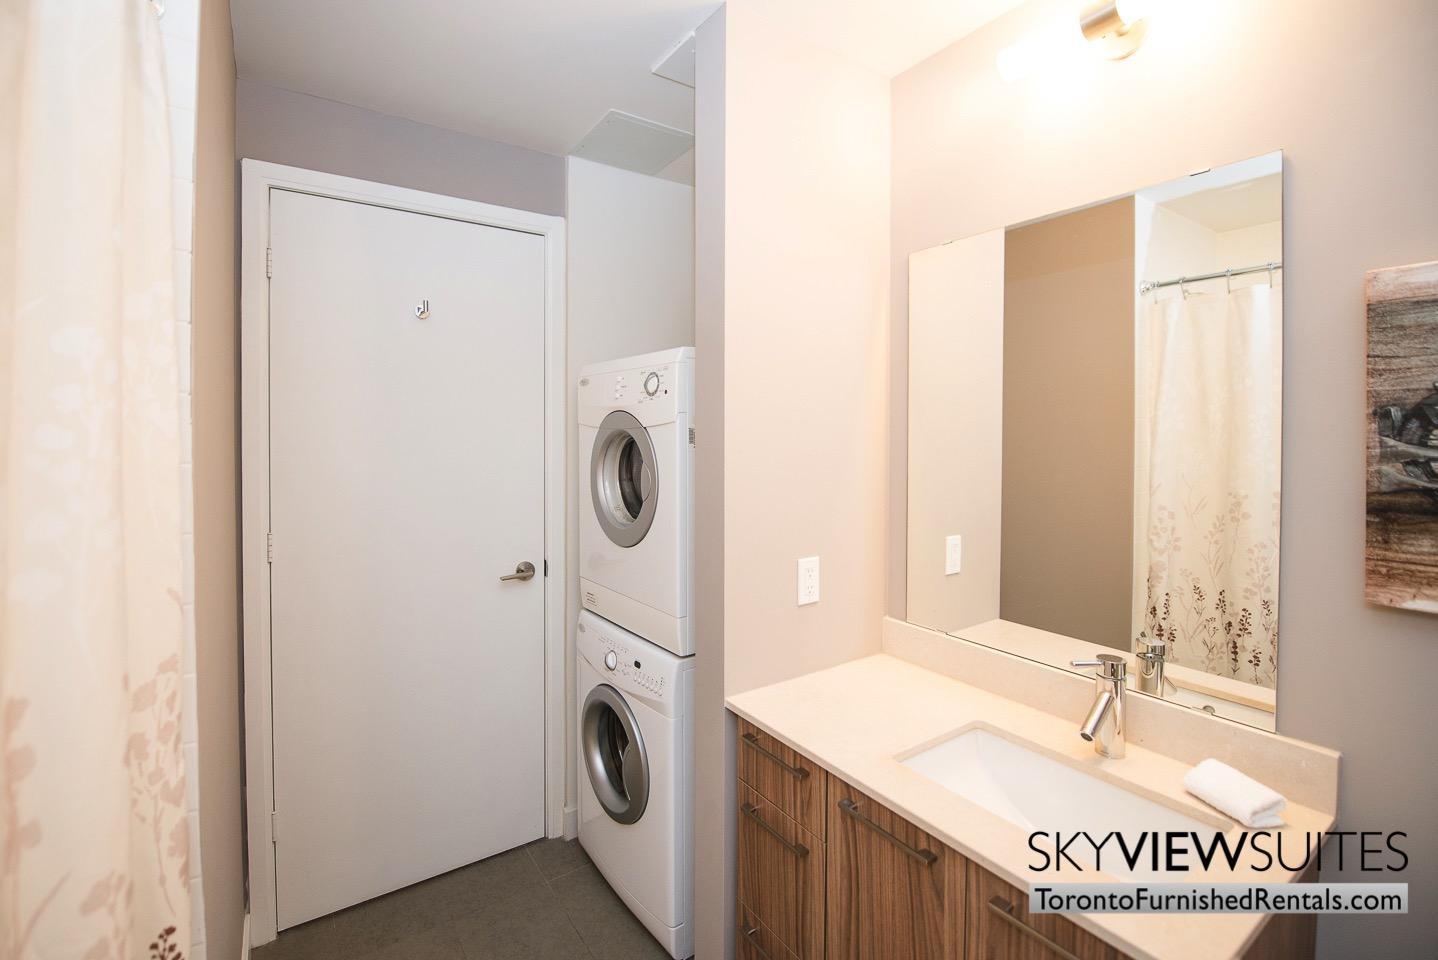 furnished-apartments-bathroom-King-west